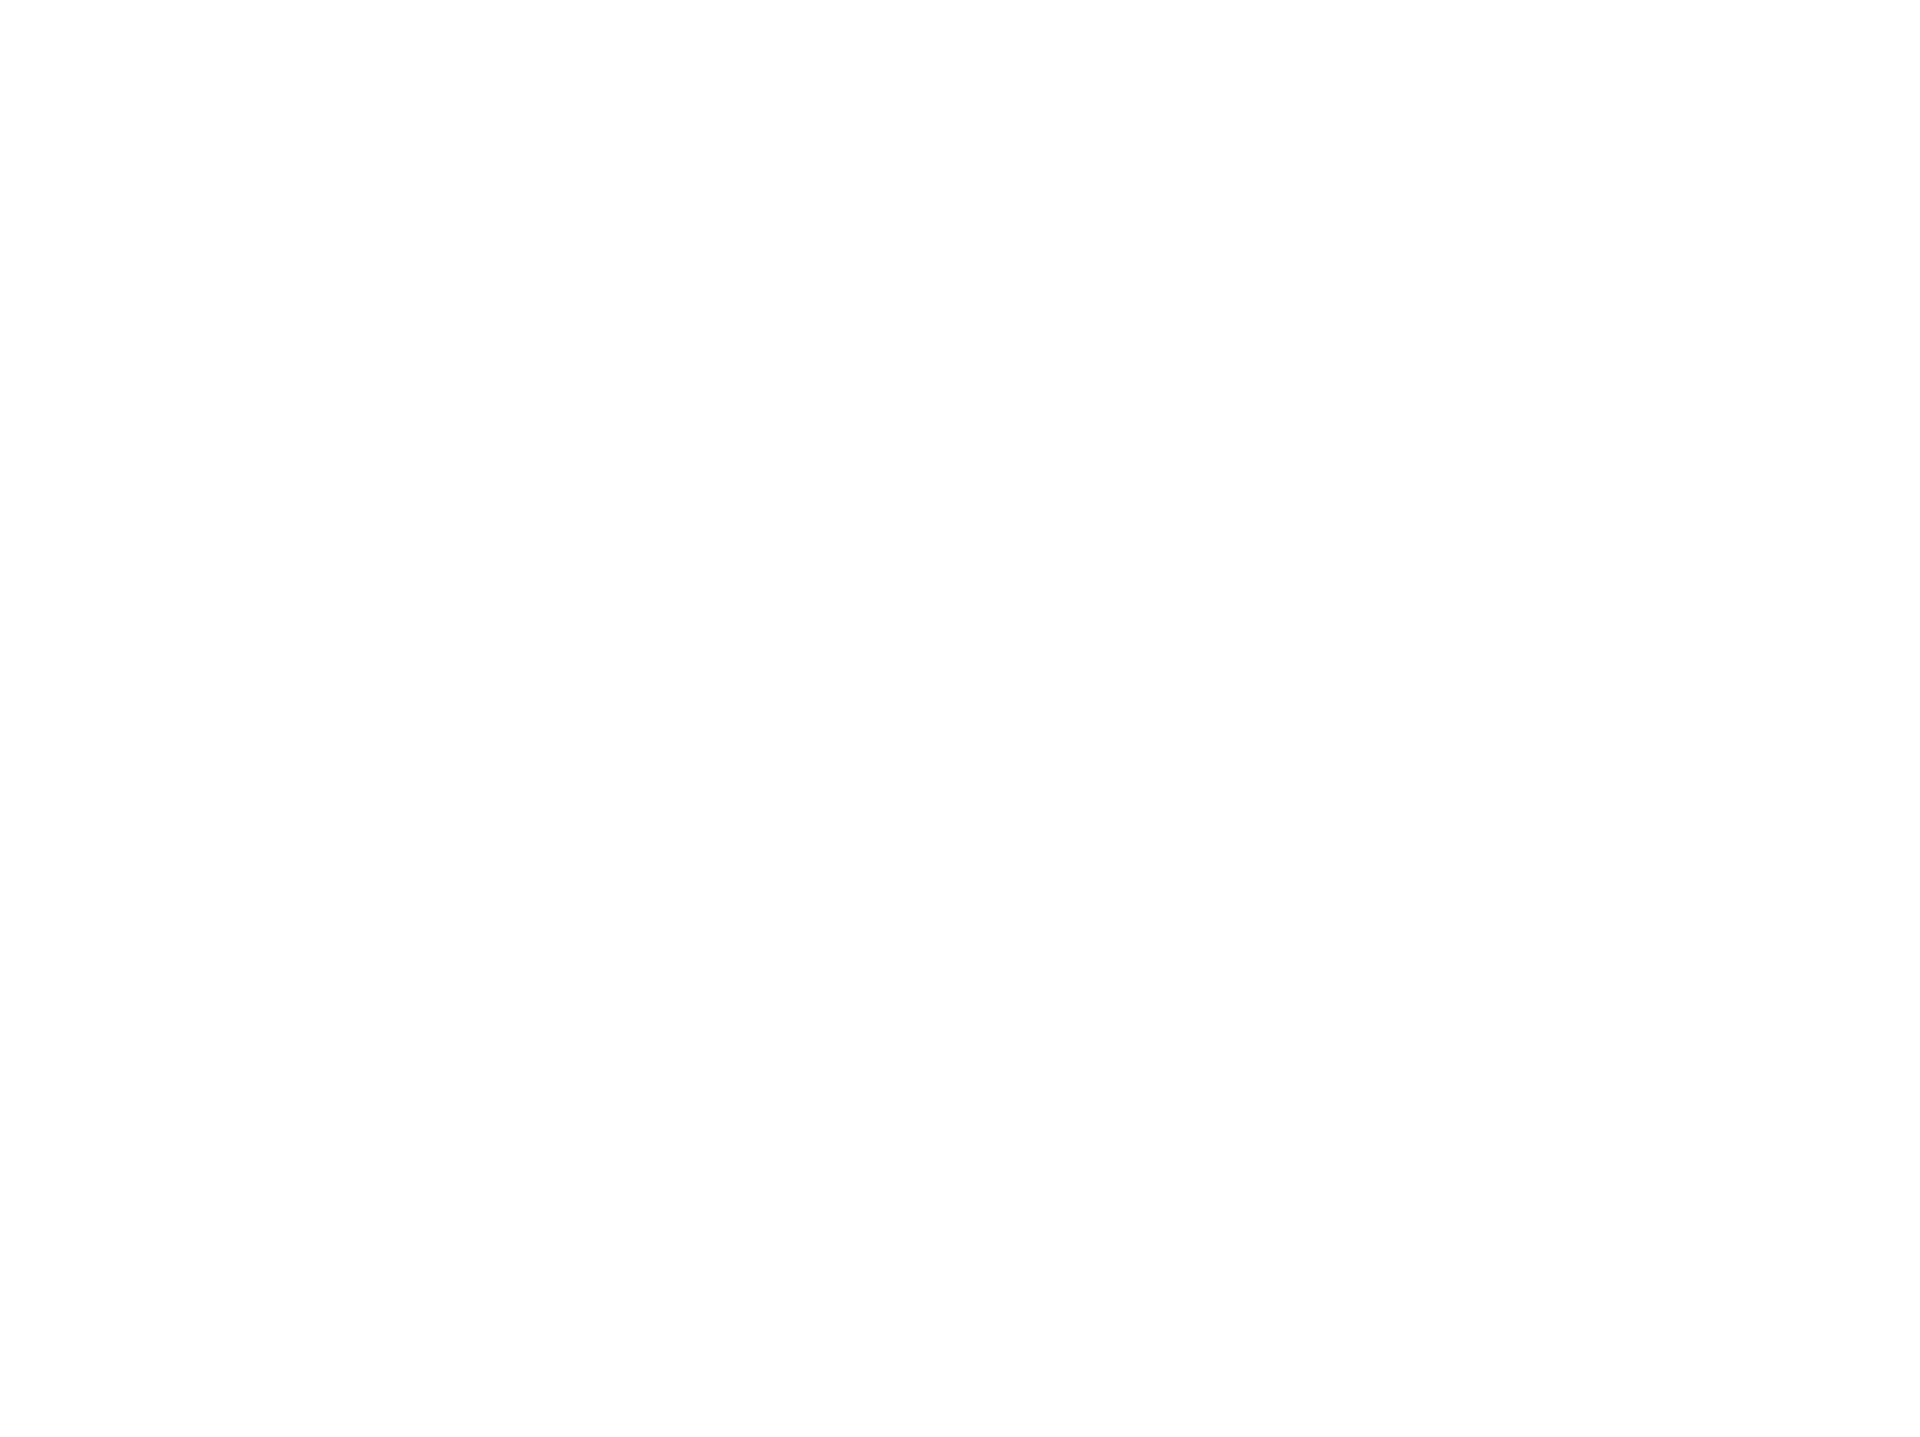 JD MARKET